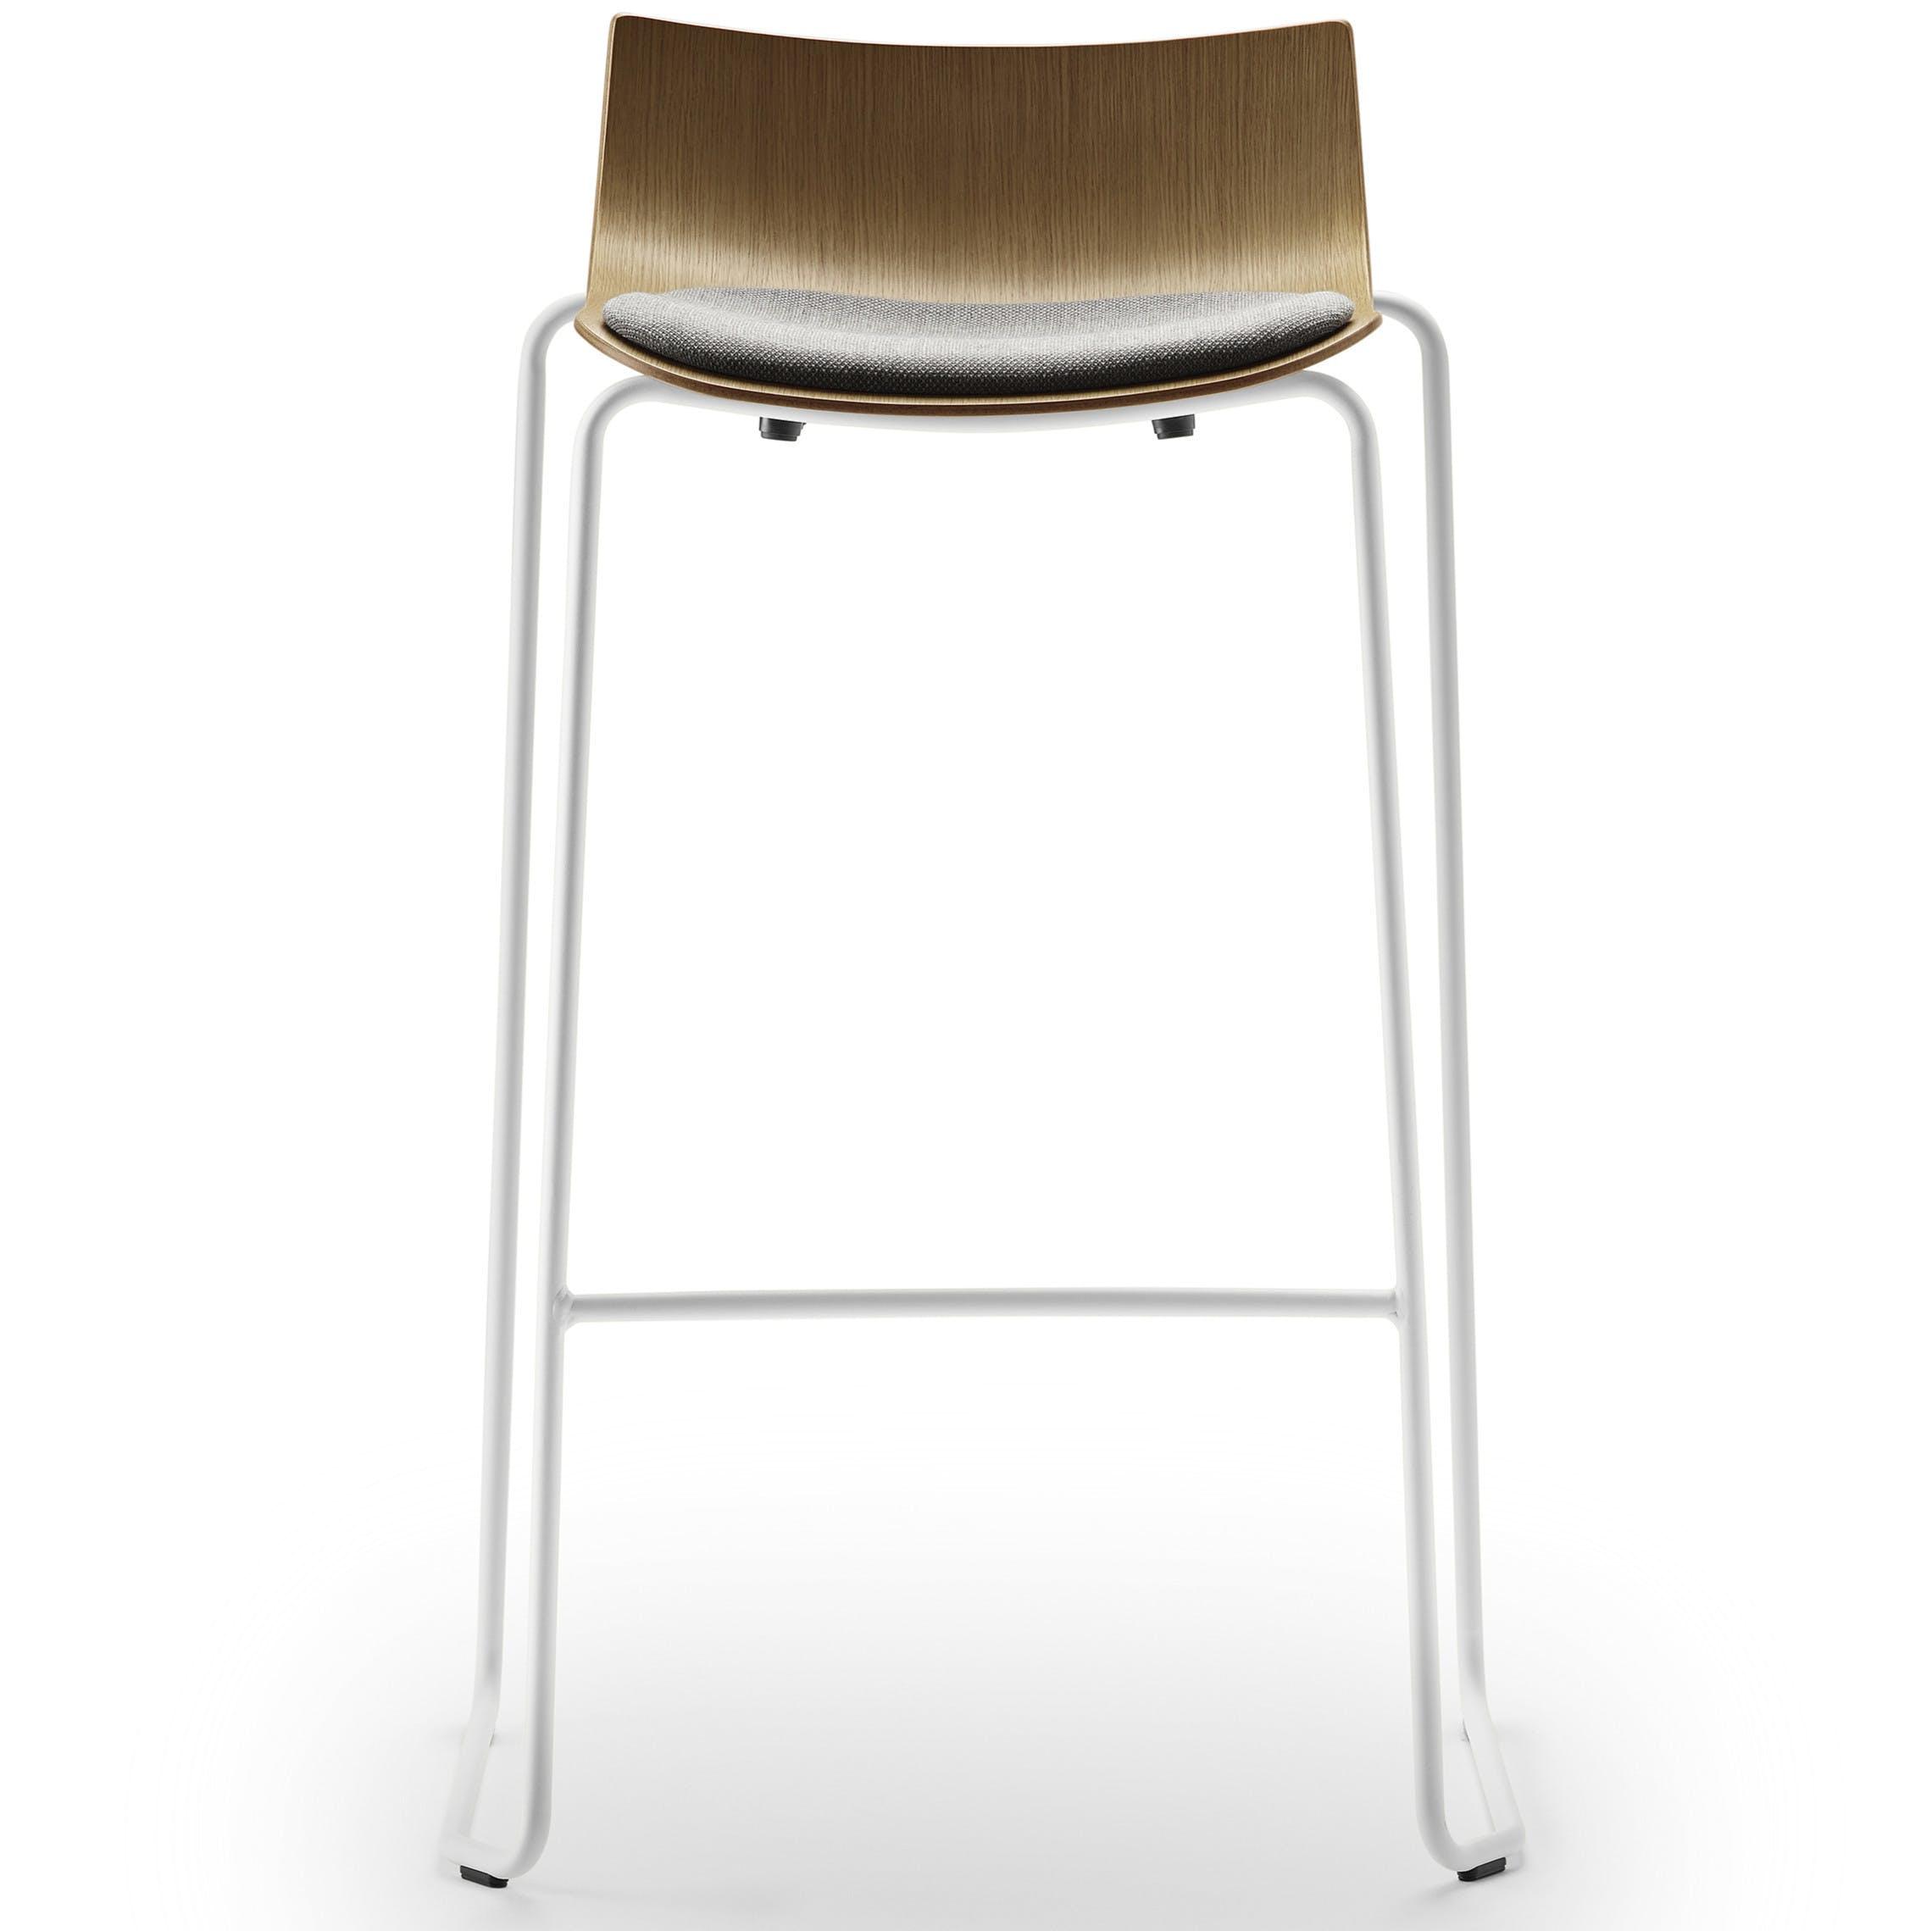 Carl-hansen-son-front-cushion-barstool-preludia-haute-living